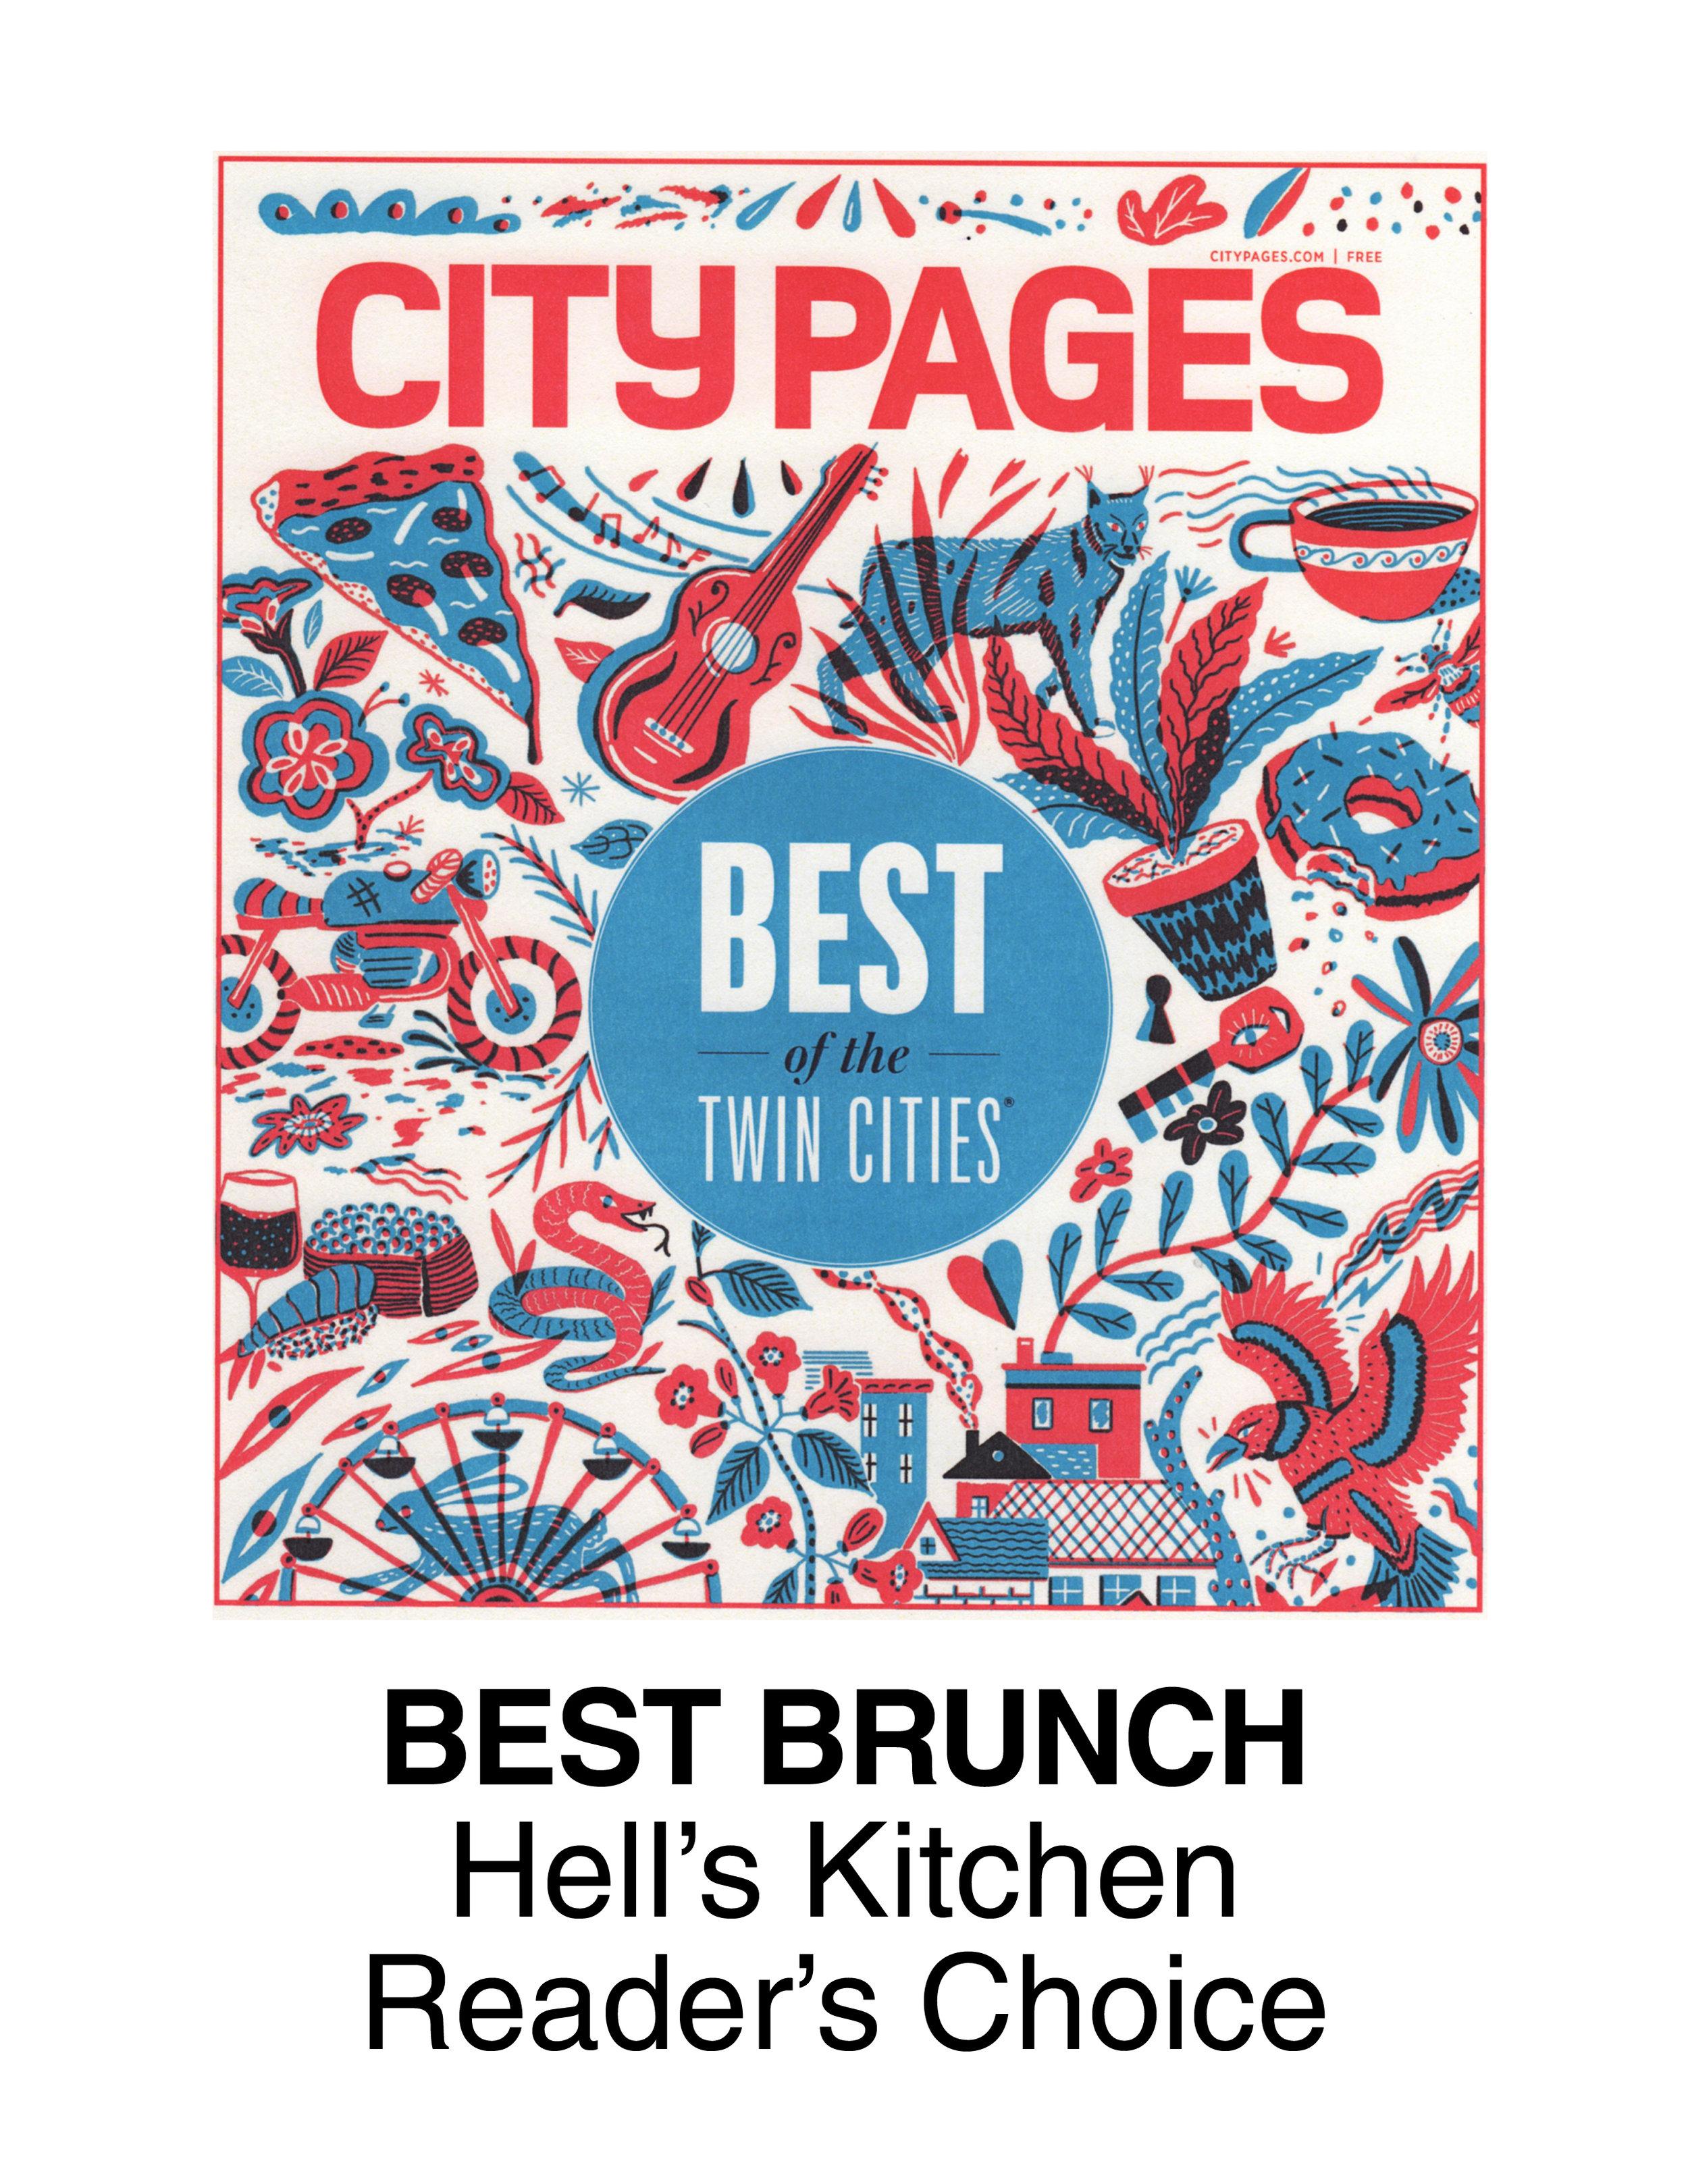 CityPagesBestBrunch2018.jpg